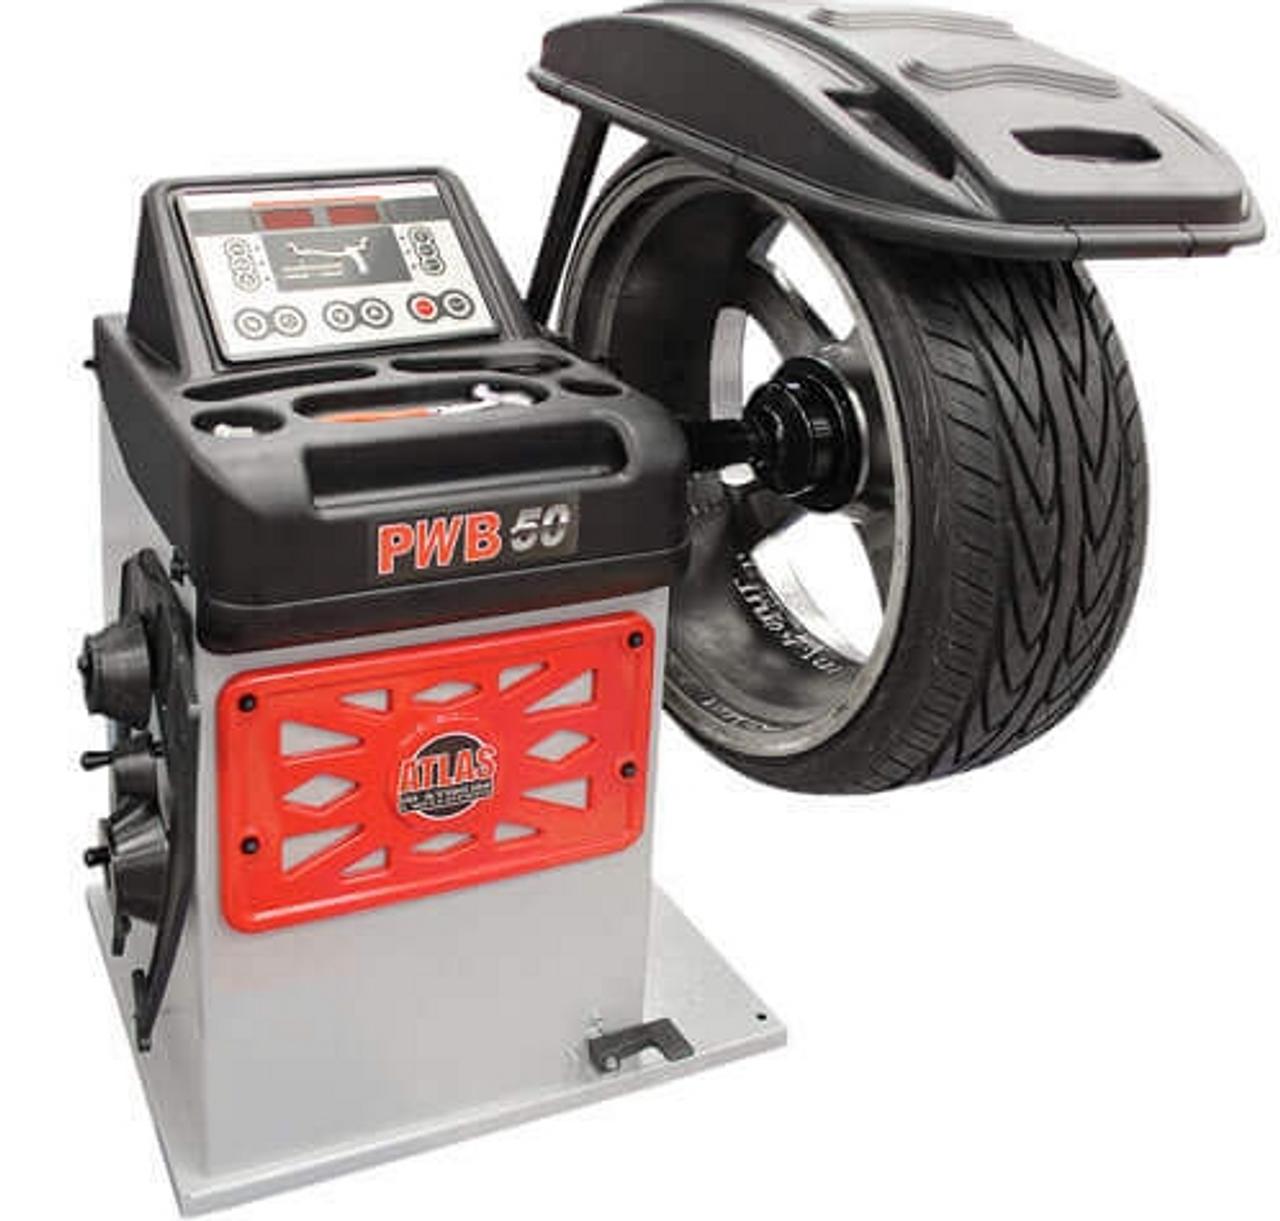 Atlas® Platinum PWB50 2D Wheel Balancer